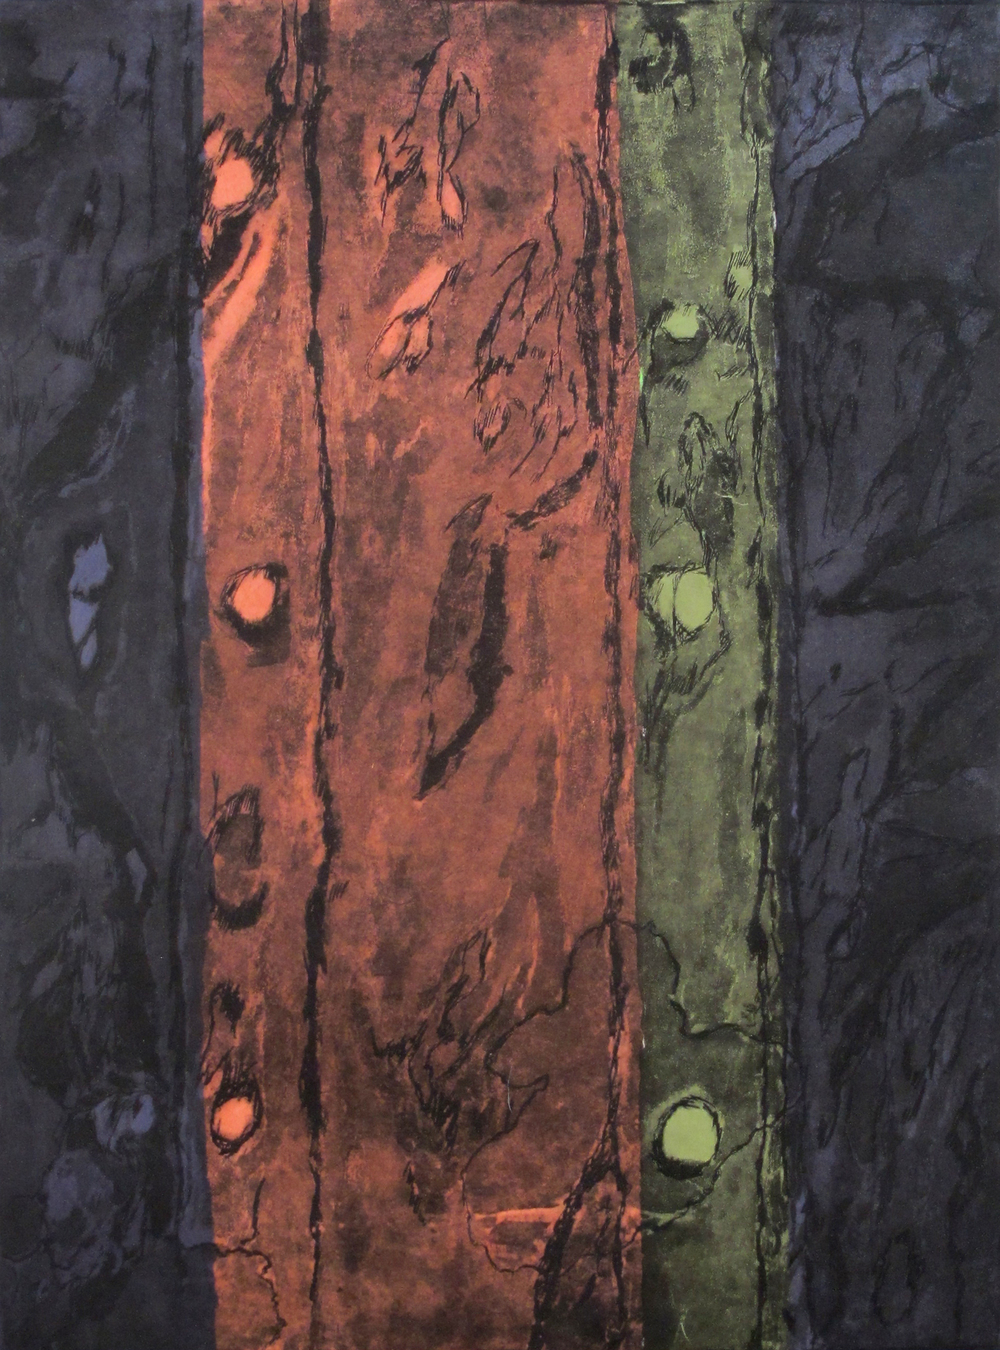 Volga Locks 4  Dorothy Dempsey DO 235 Etching/Collage 30'' x 22.25''